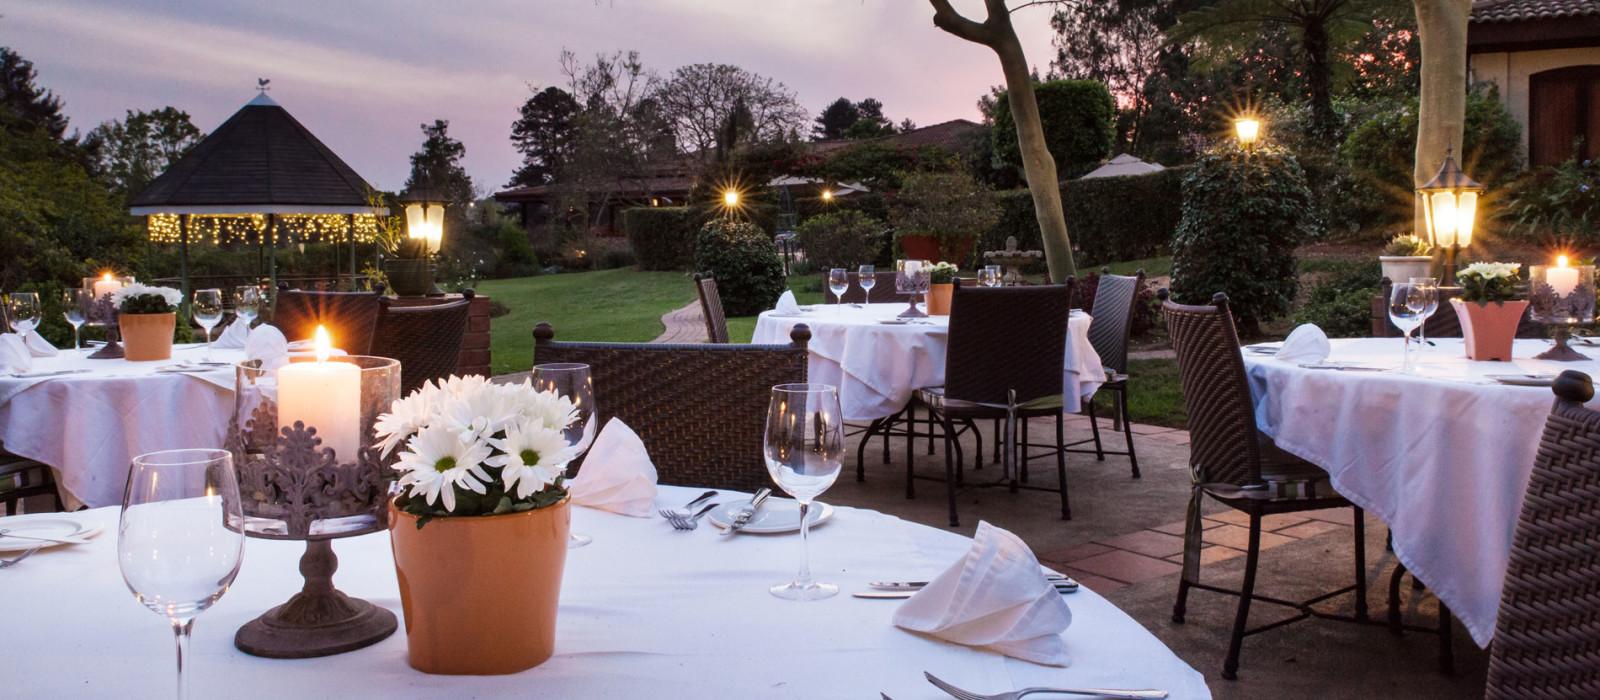 Hotel Oliver's Restaurant & Lodge South Africa